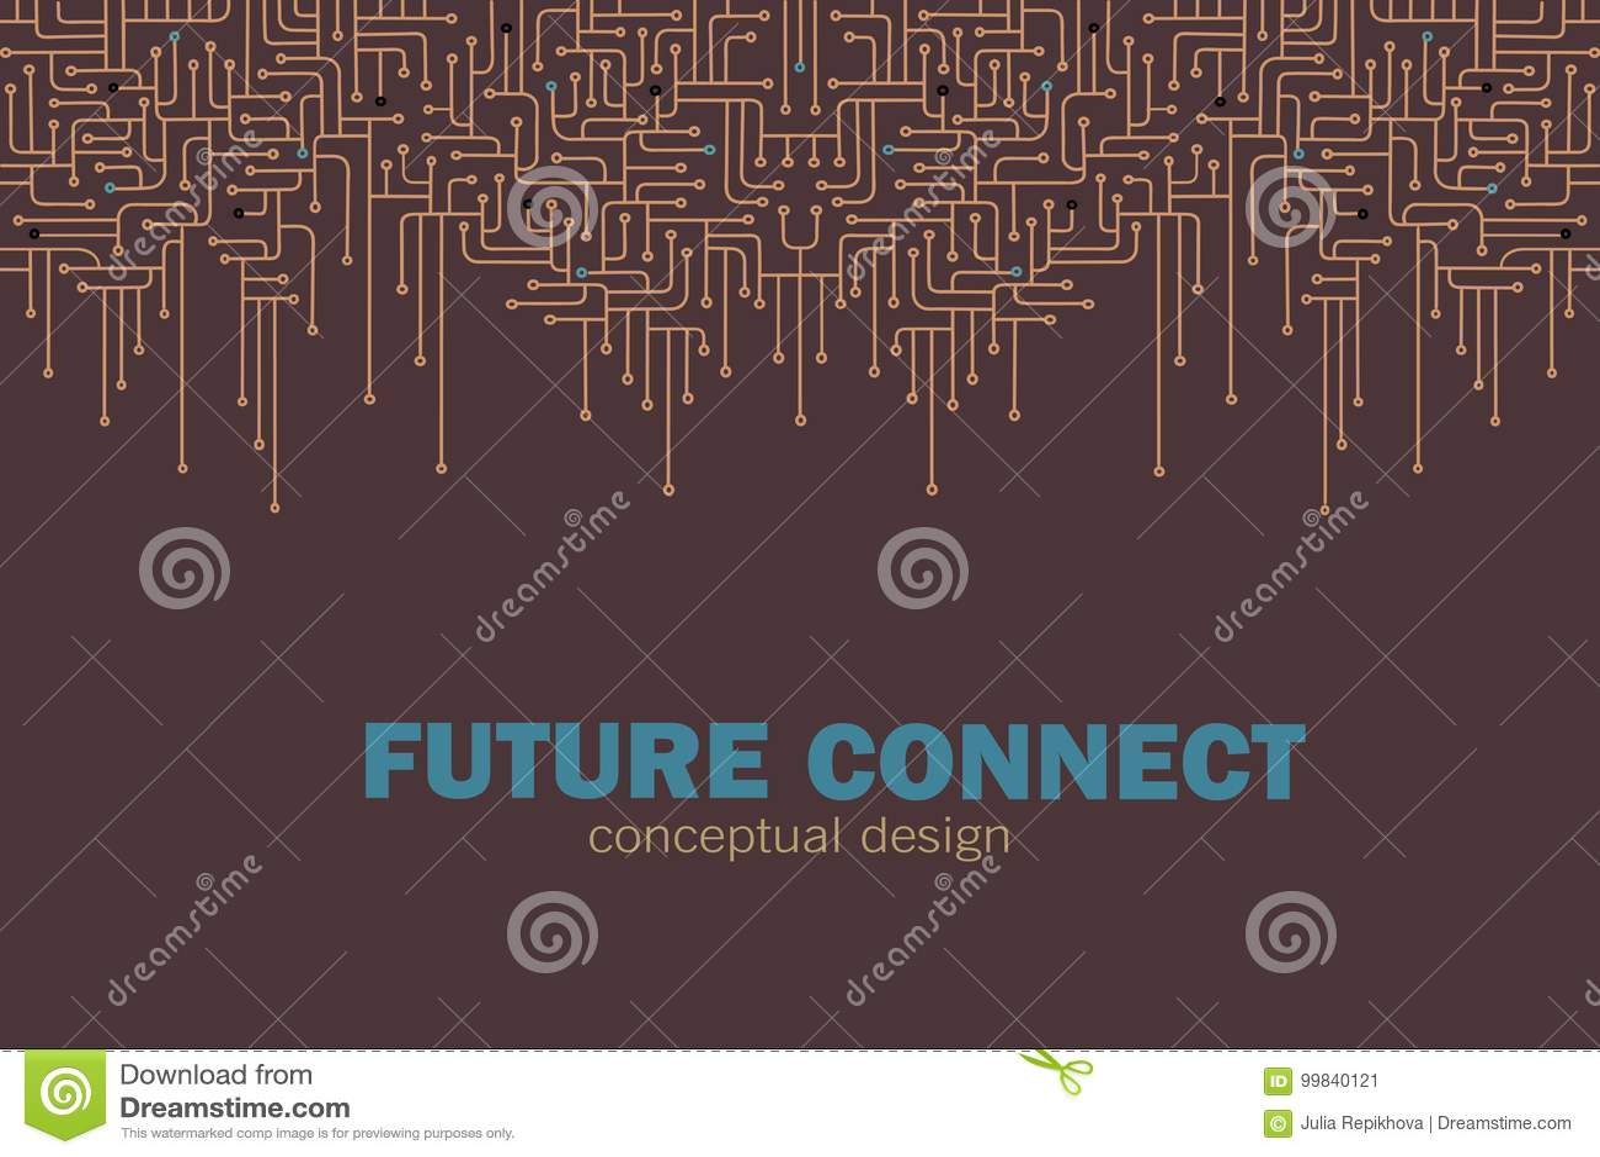 electronic circuit background spu circuit lines design futureelectronic circuit background spu circuit lines design future concept